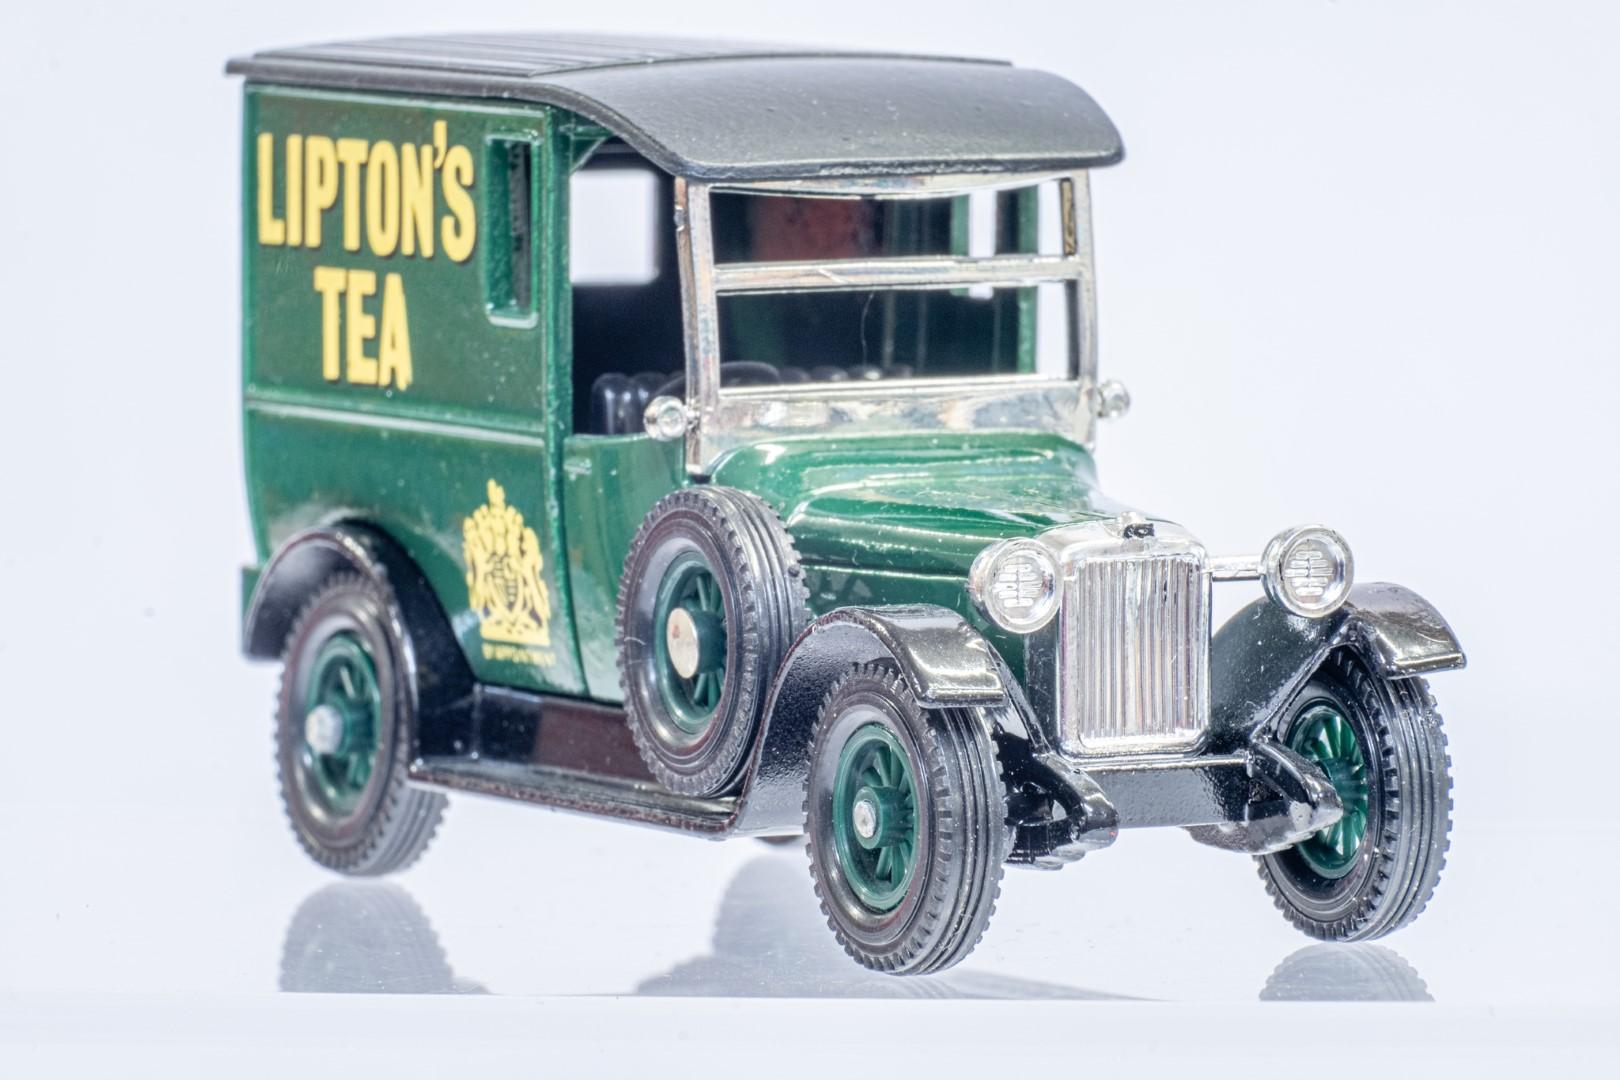 Matchbox 1927 Talbot Van Y-5 - Liptions Tea - Rare - Image 9 of 9